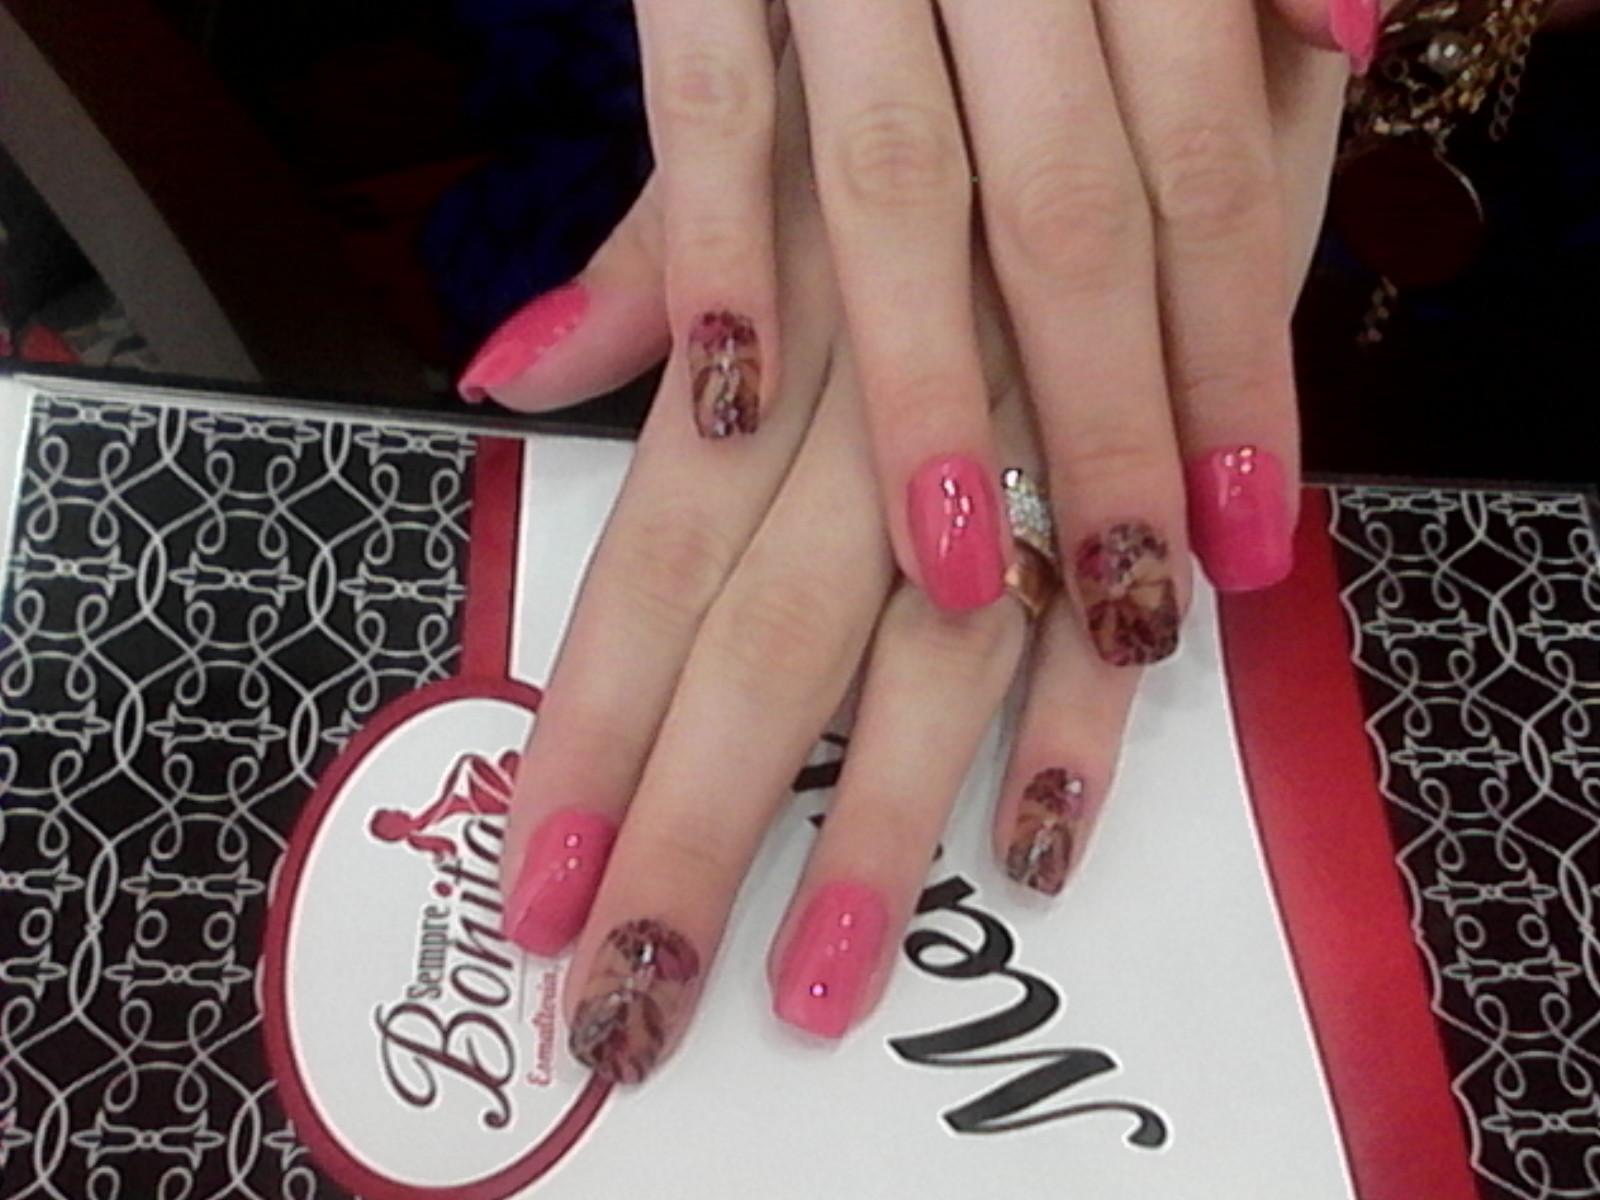 unha manicure e pedicure gerente recepcionista